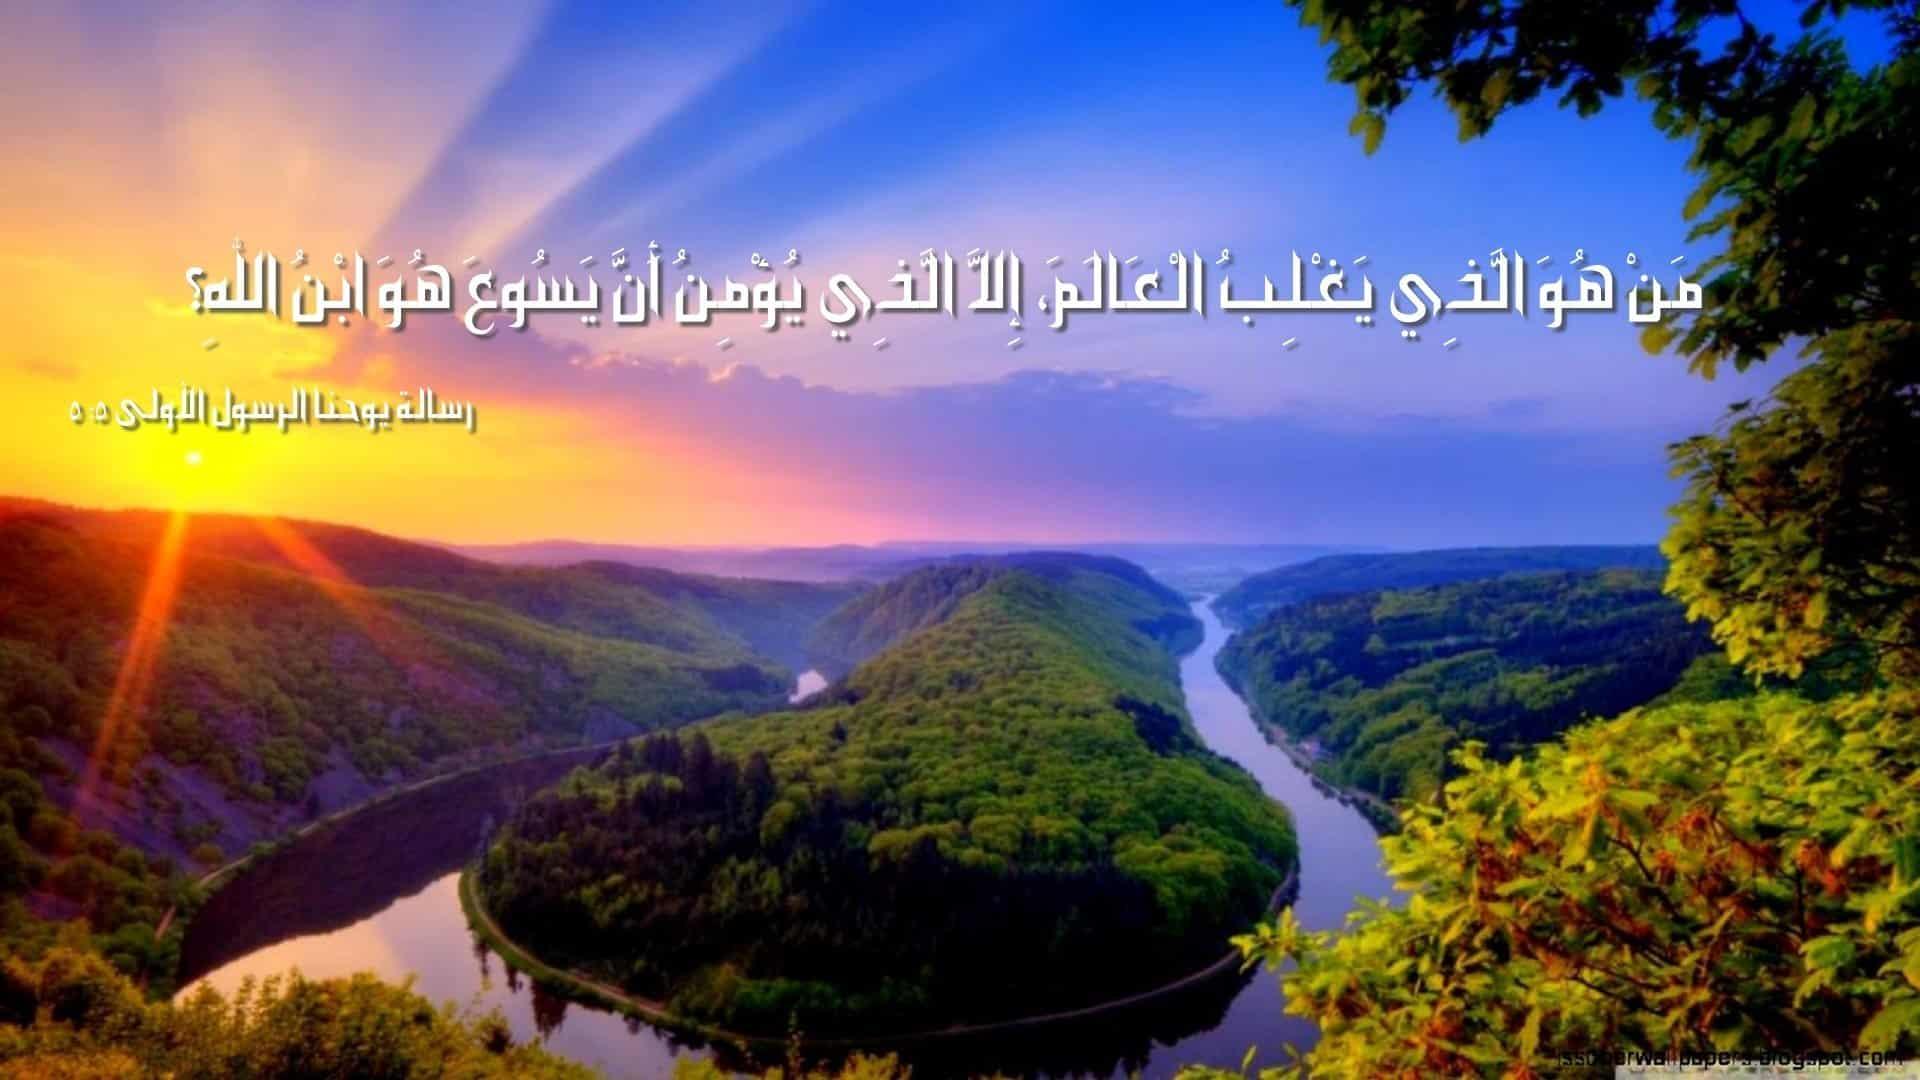 Photo of صلاة من أجل نيل القوة وطرد كل قوى الشر الحسد والنجاسه